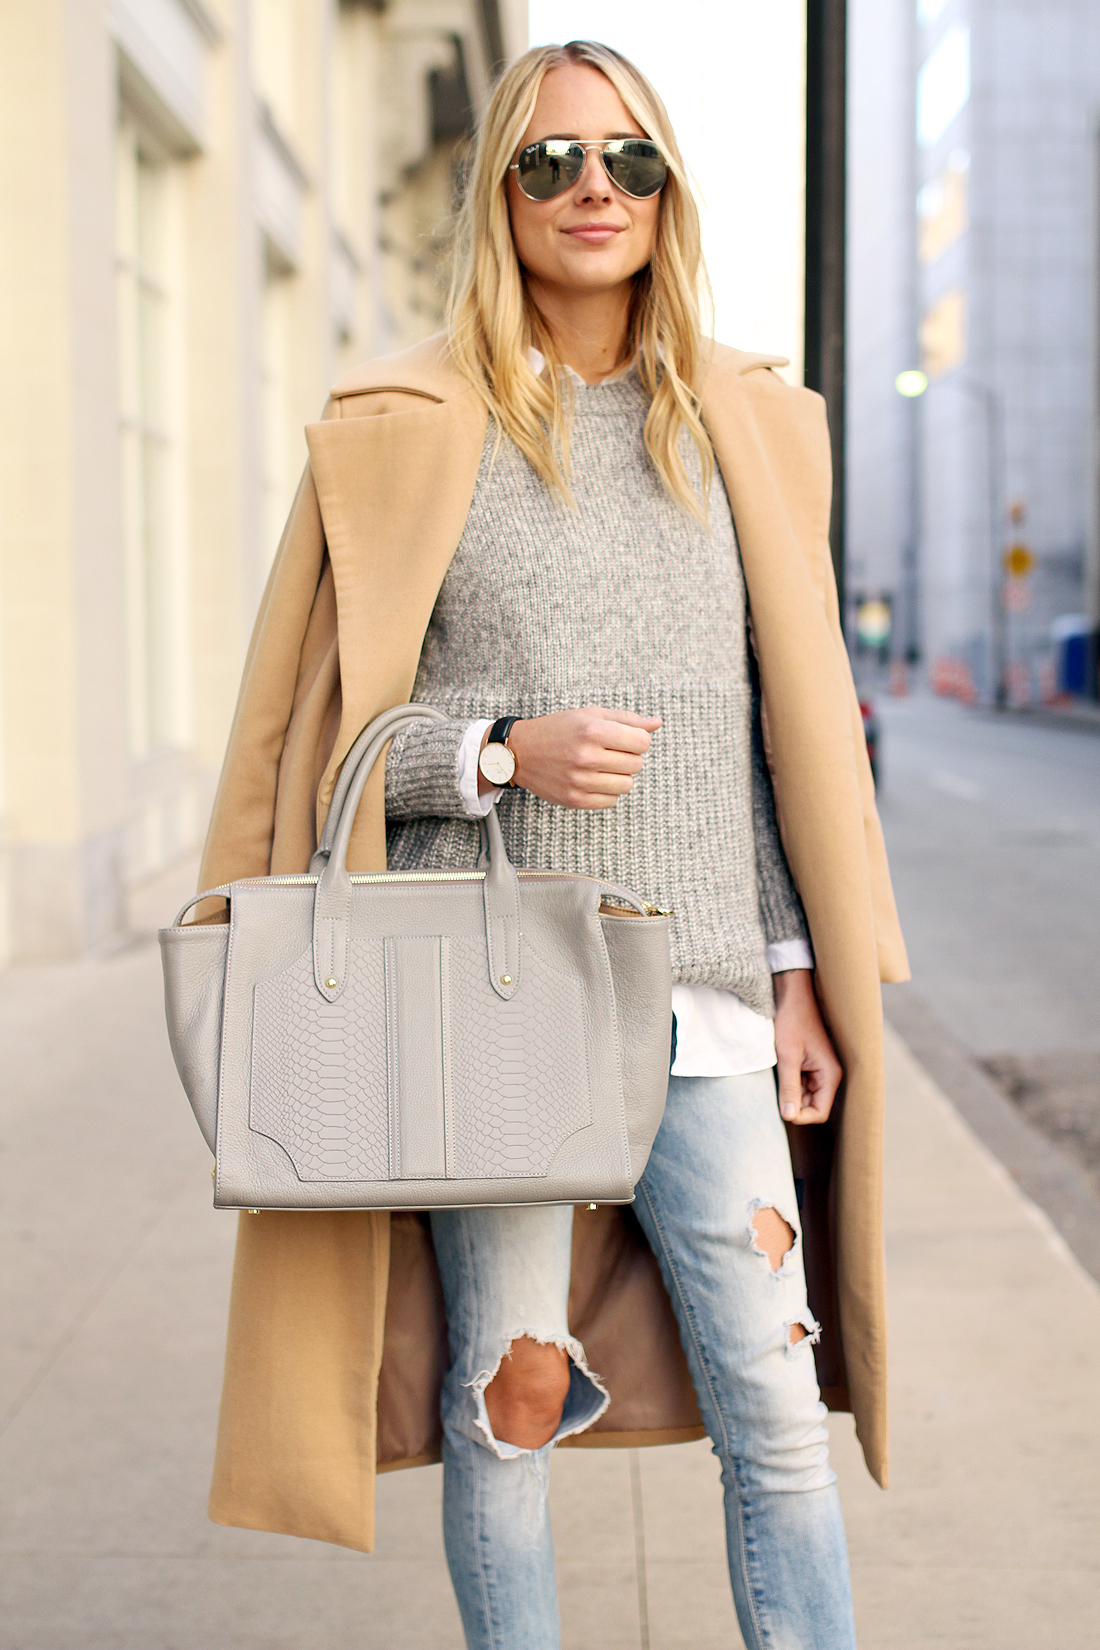 fashion-jackson-gigi-new-york-gates-statchel-grey-camel-coat-grey-sweater-ripped-skinny-jeans